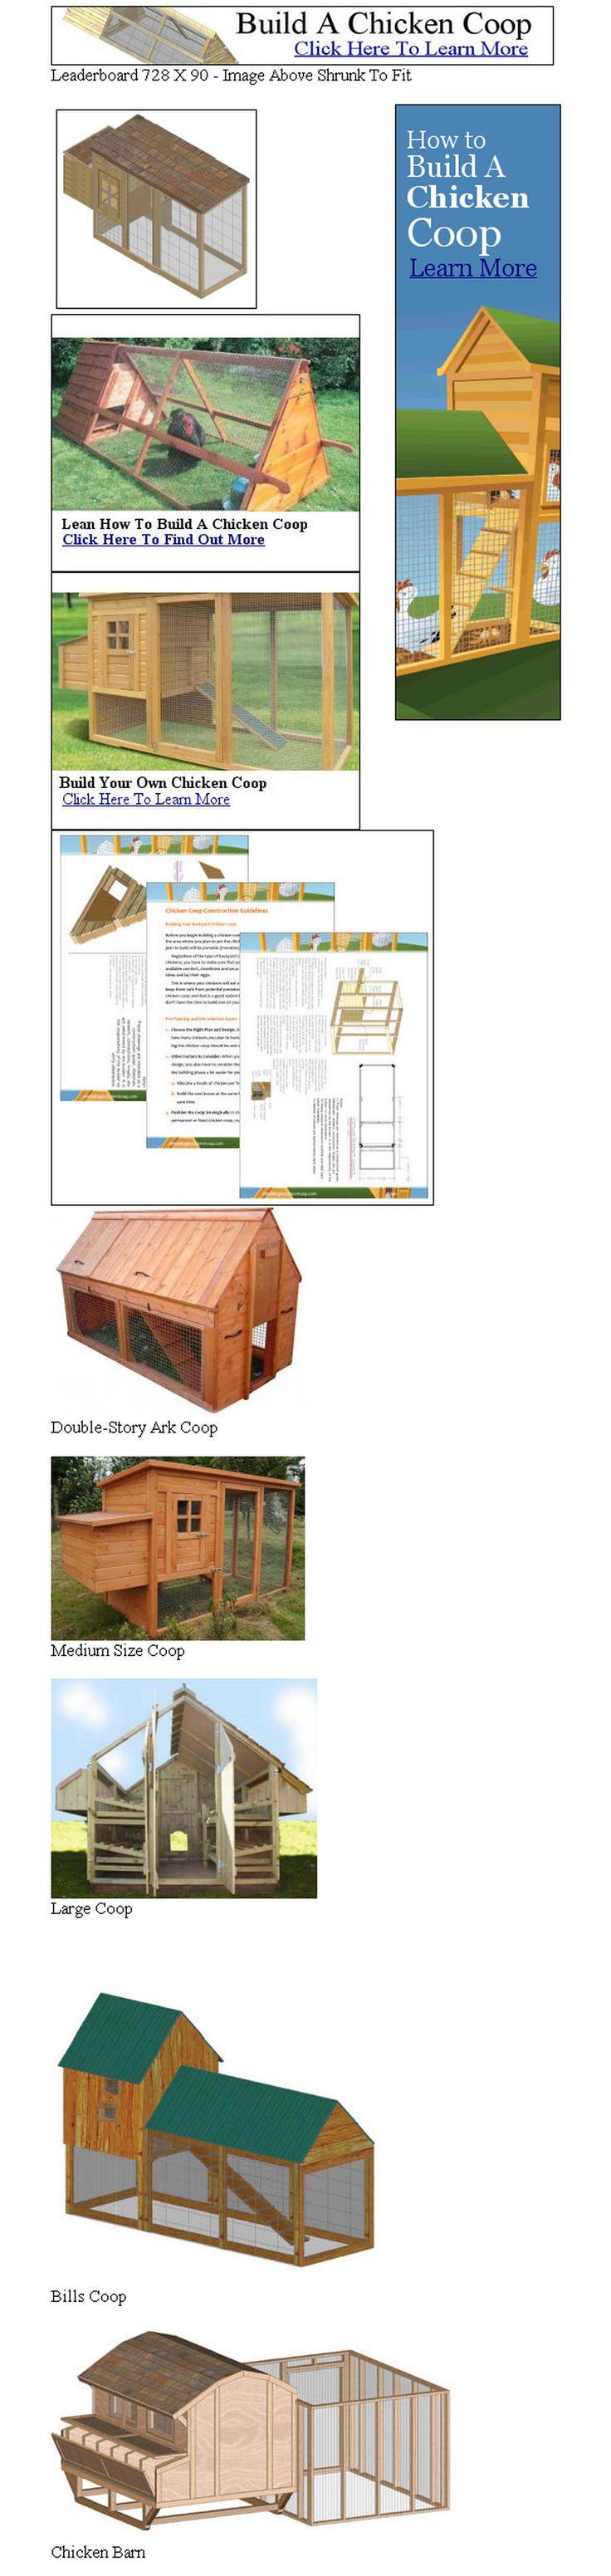 9 best build backyard chicken coop images on pinterest hen house